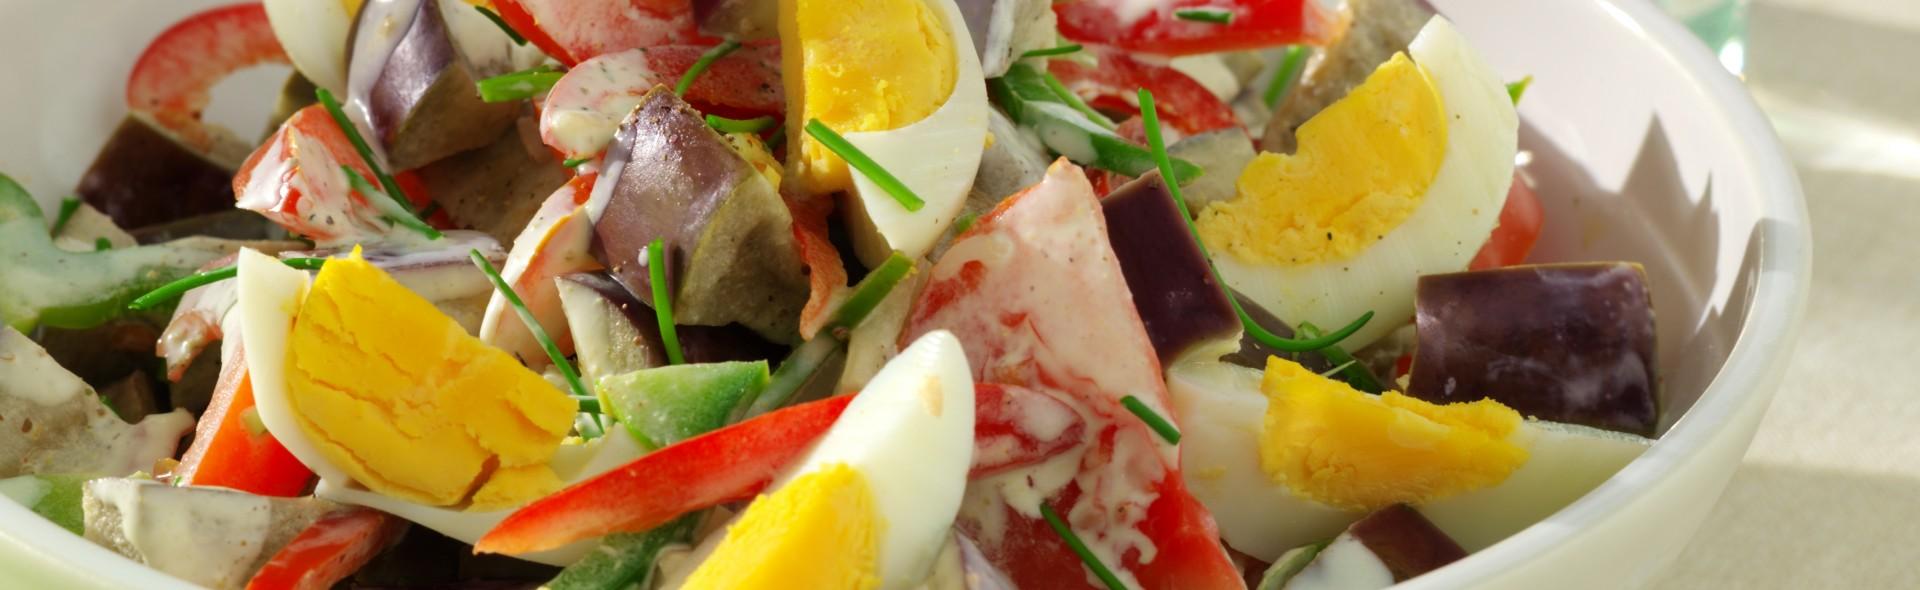 salade d 39 aubergine aux oeufs love my salad. Black Bedroom Furniture Sets. Home Design Ideas